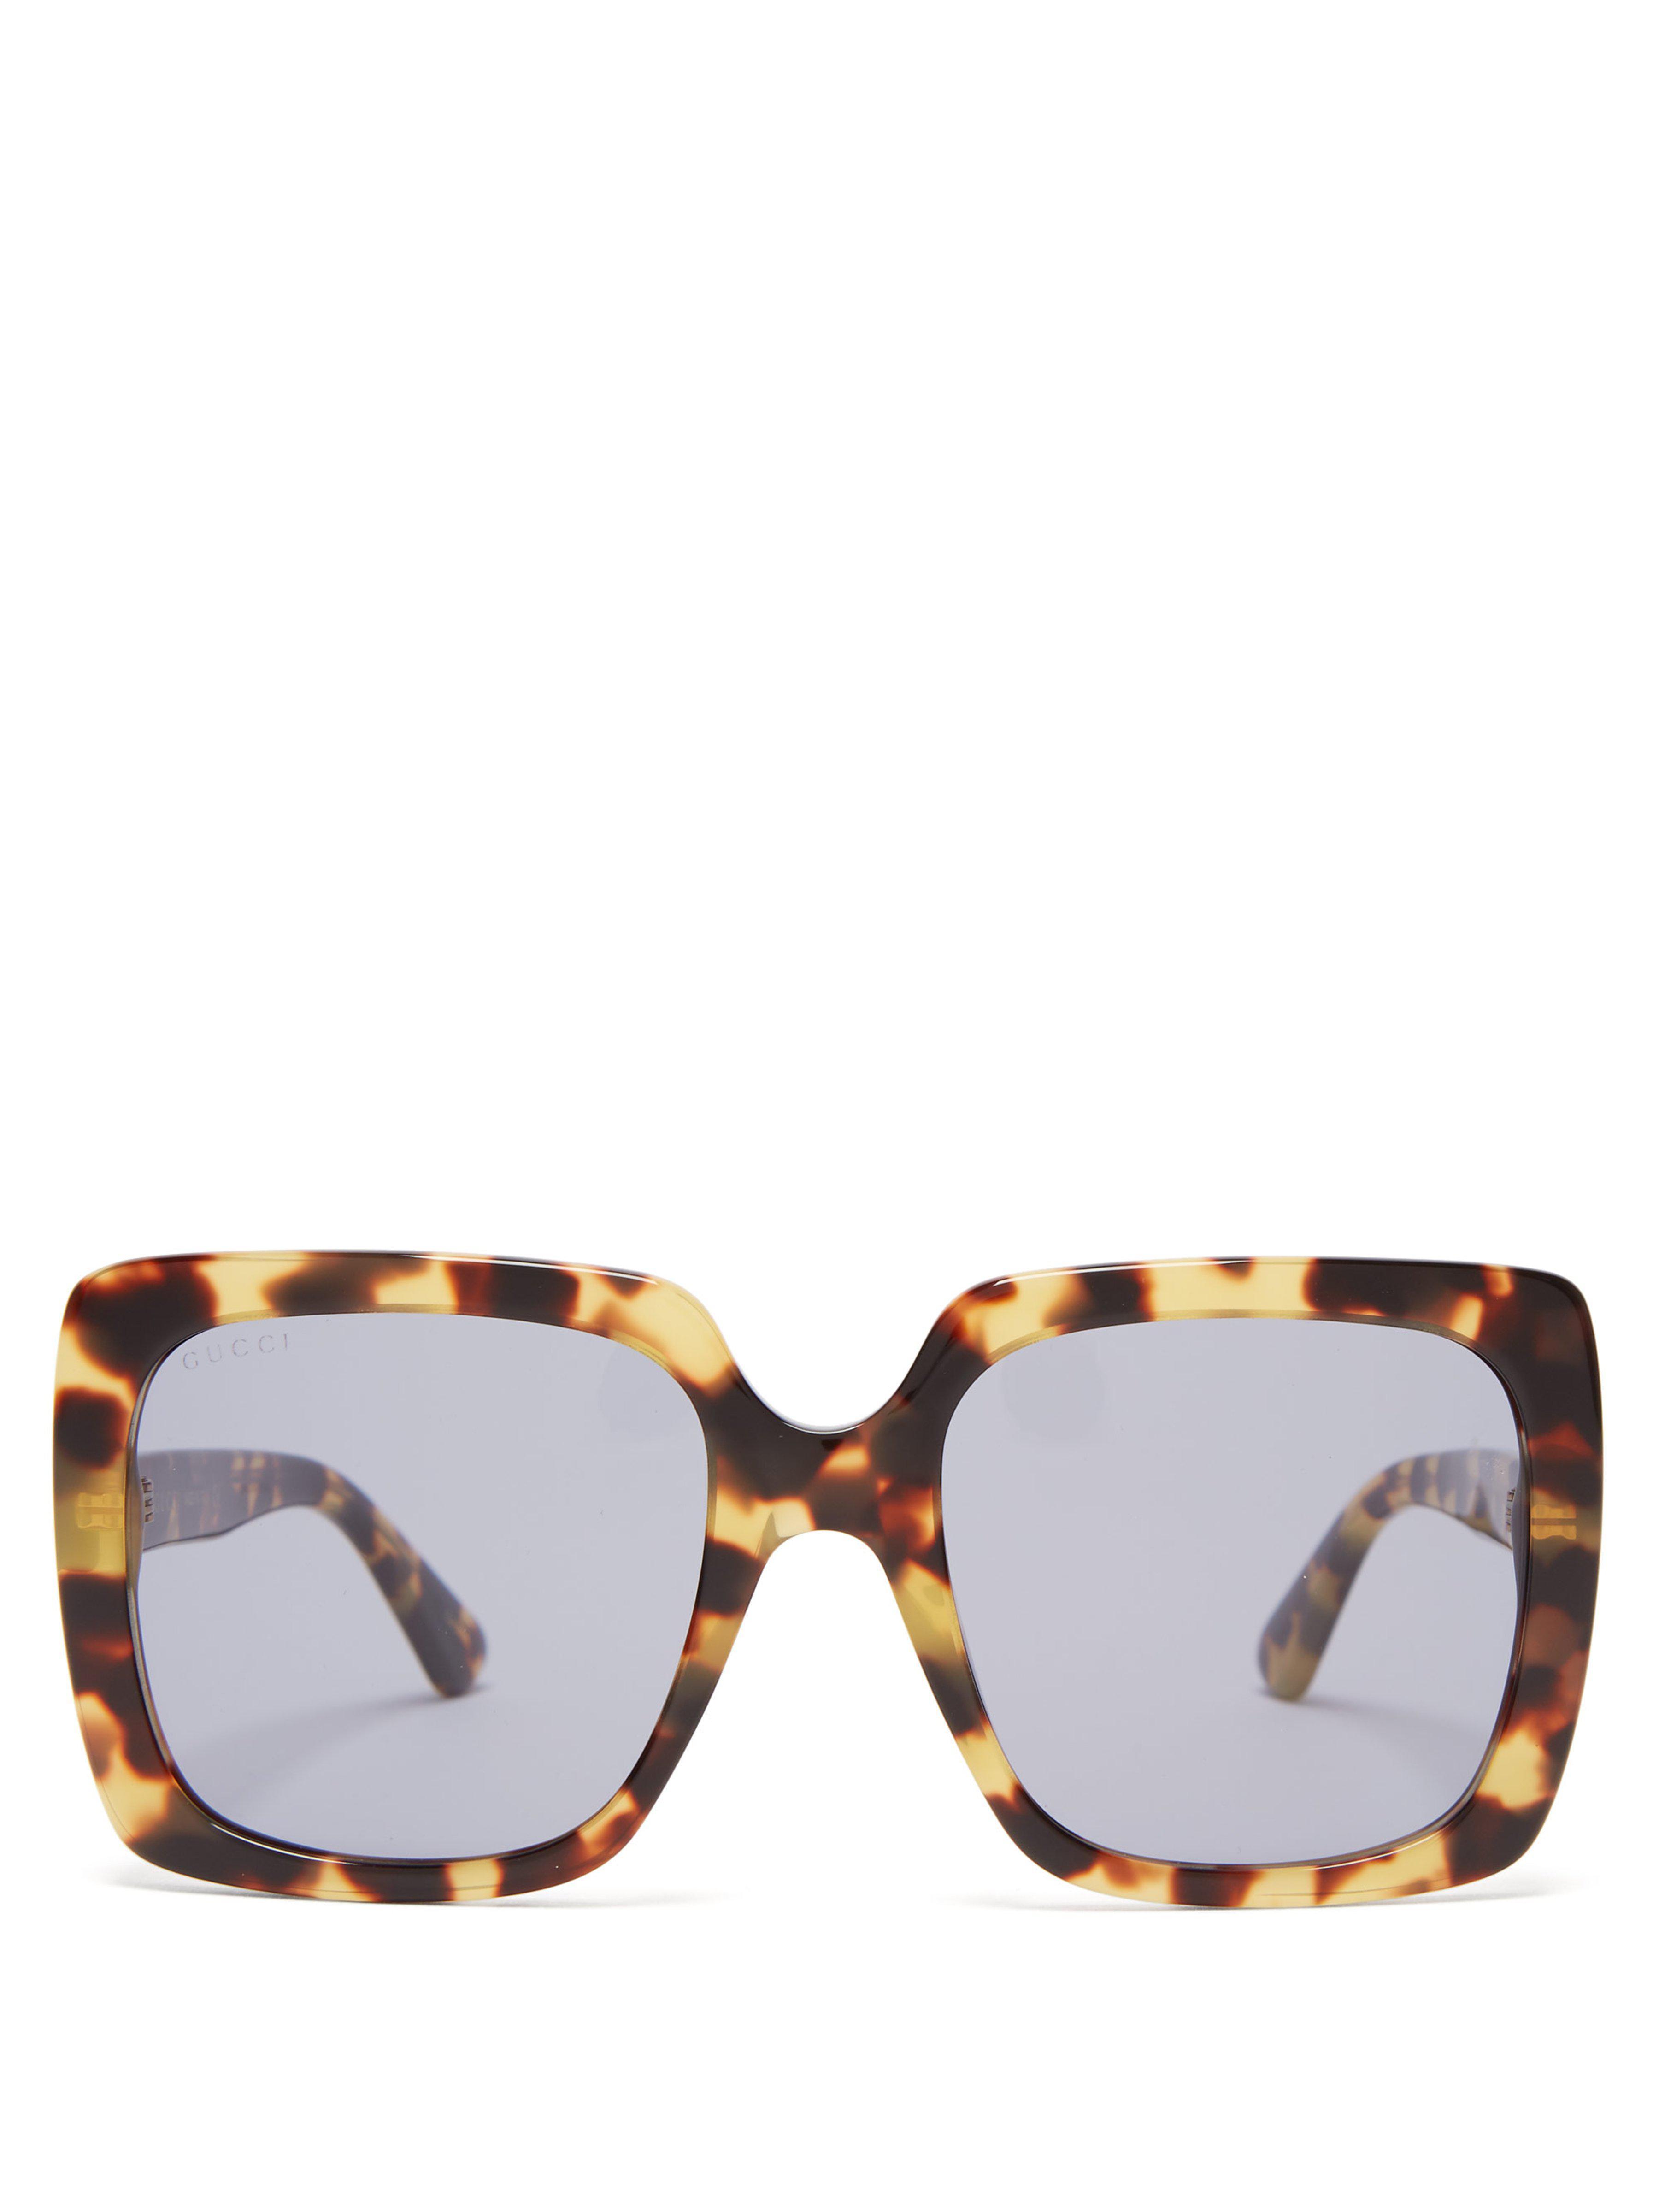 a0183d6d44 Gucci - Multicolor Oversized Square Frame Sunglasses - Lyst. View fullscreen